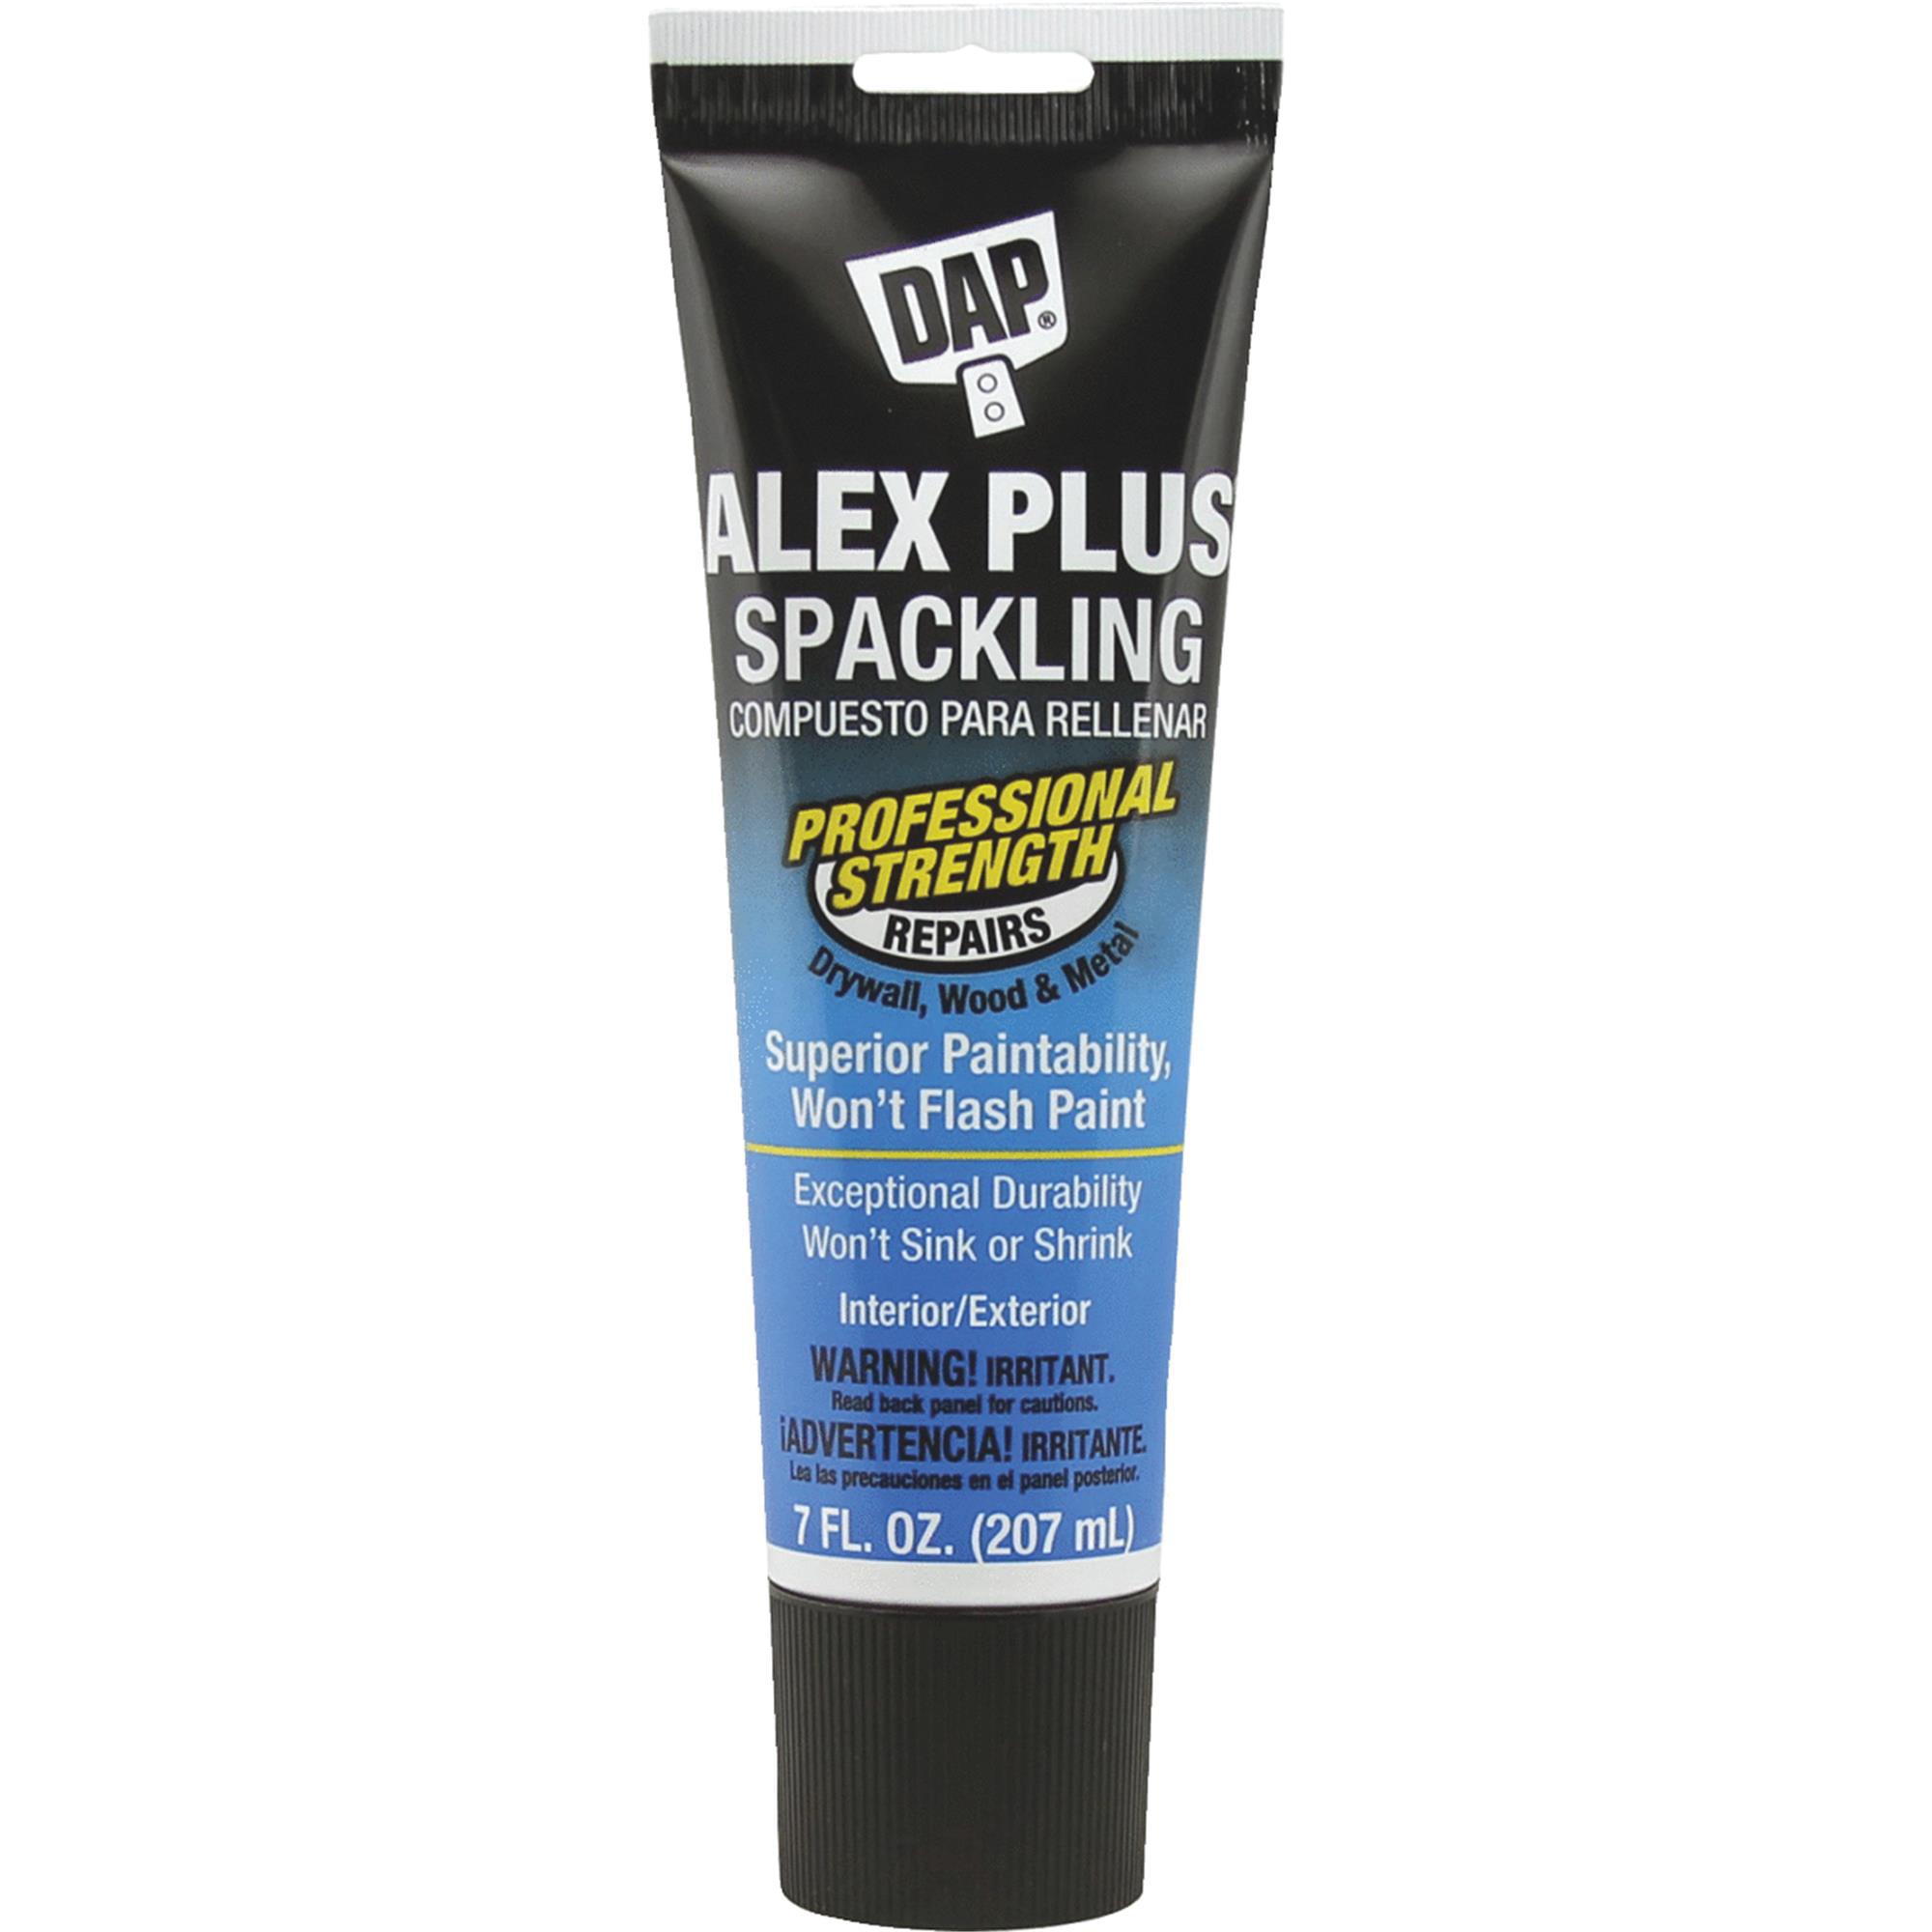 DAP ALEX PLUS Spackling, 7 oz